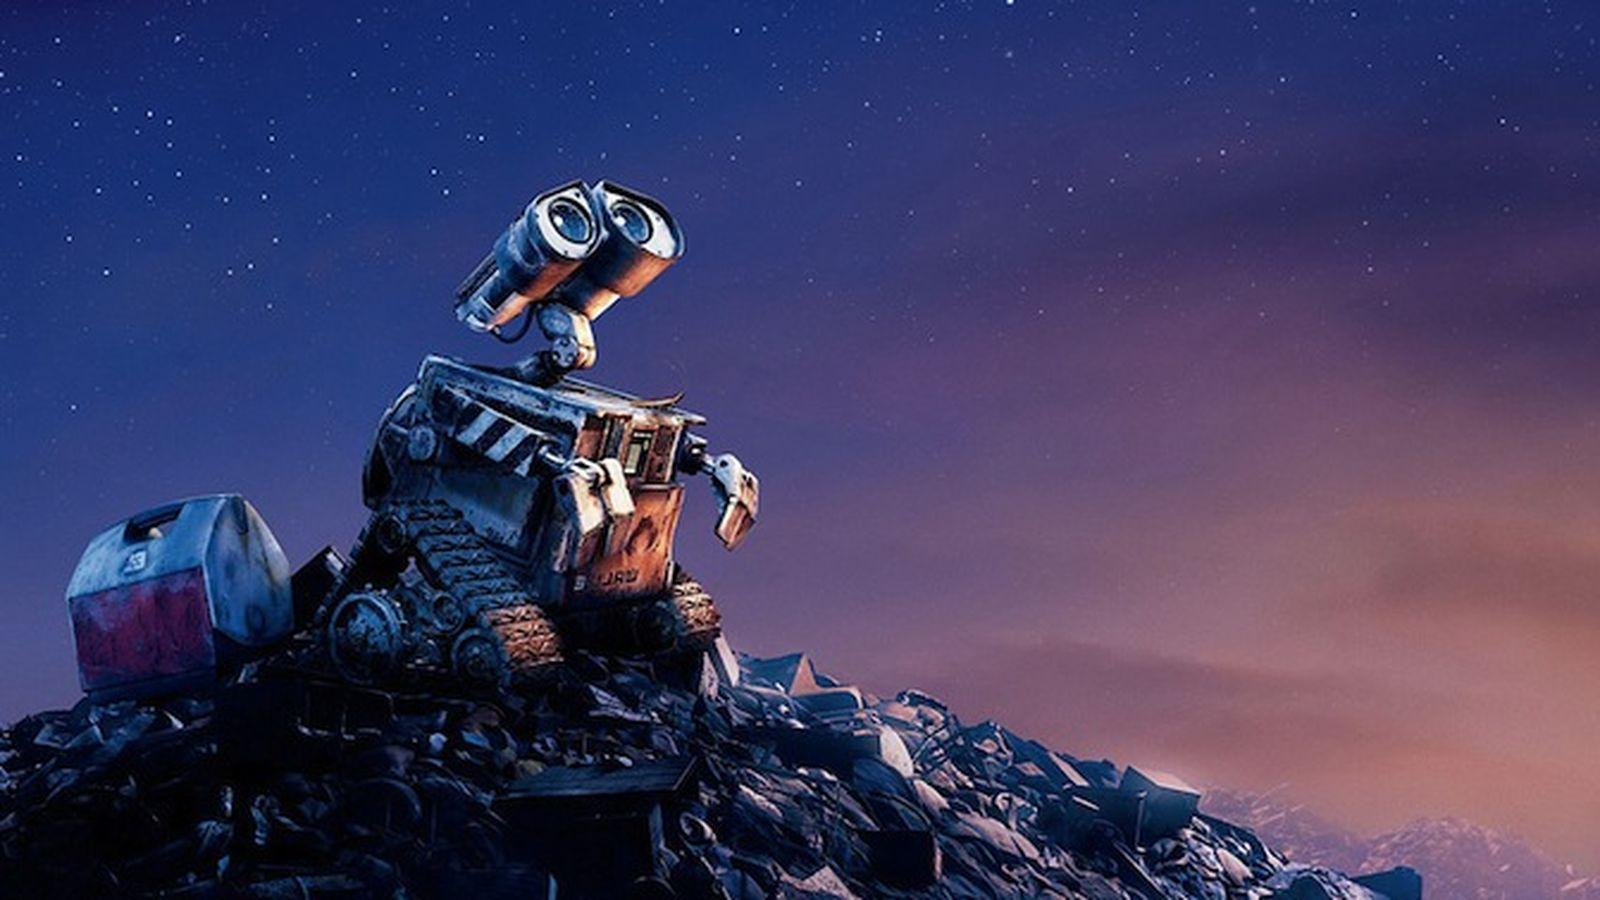 WALL-E – famous robot